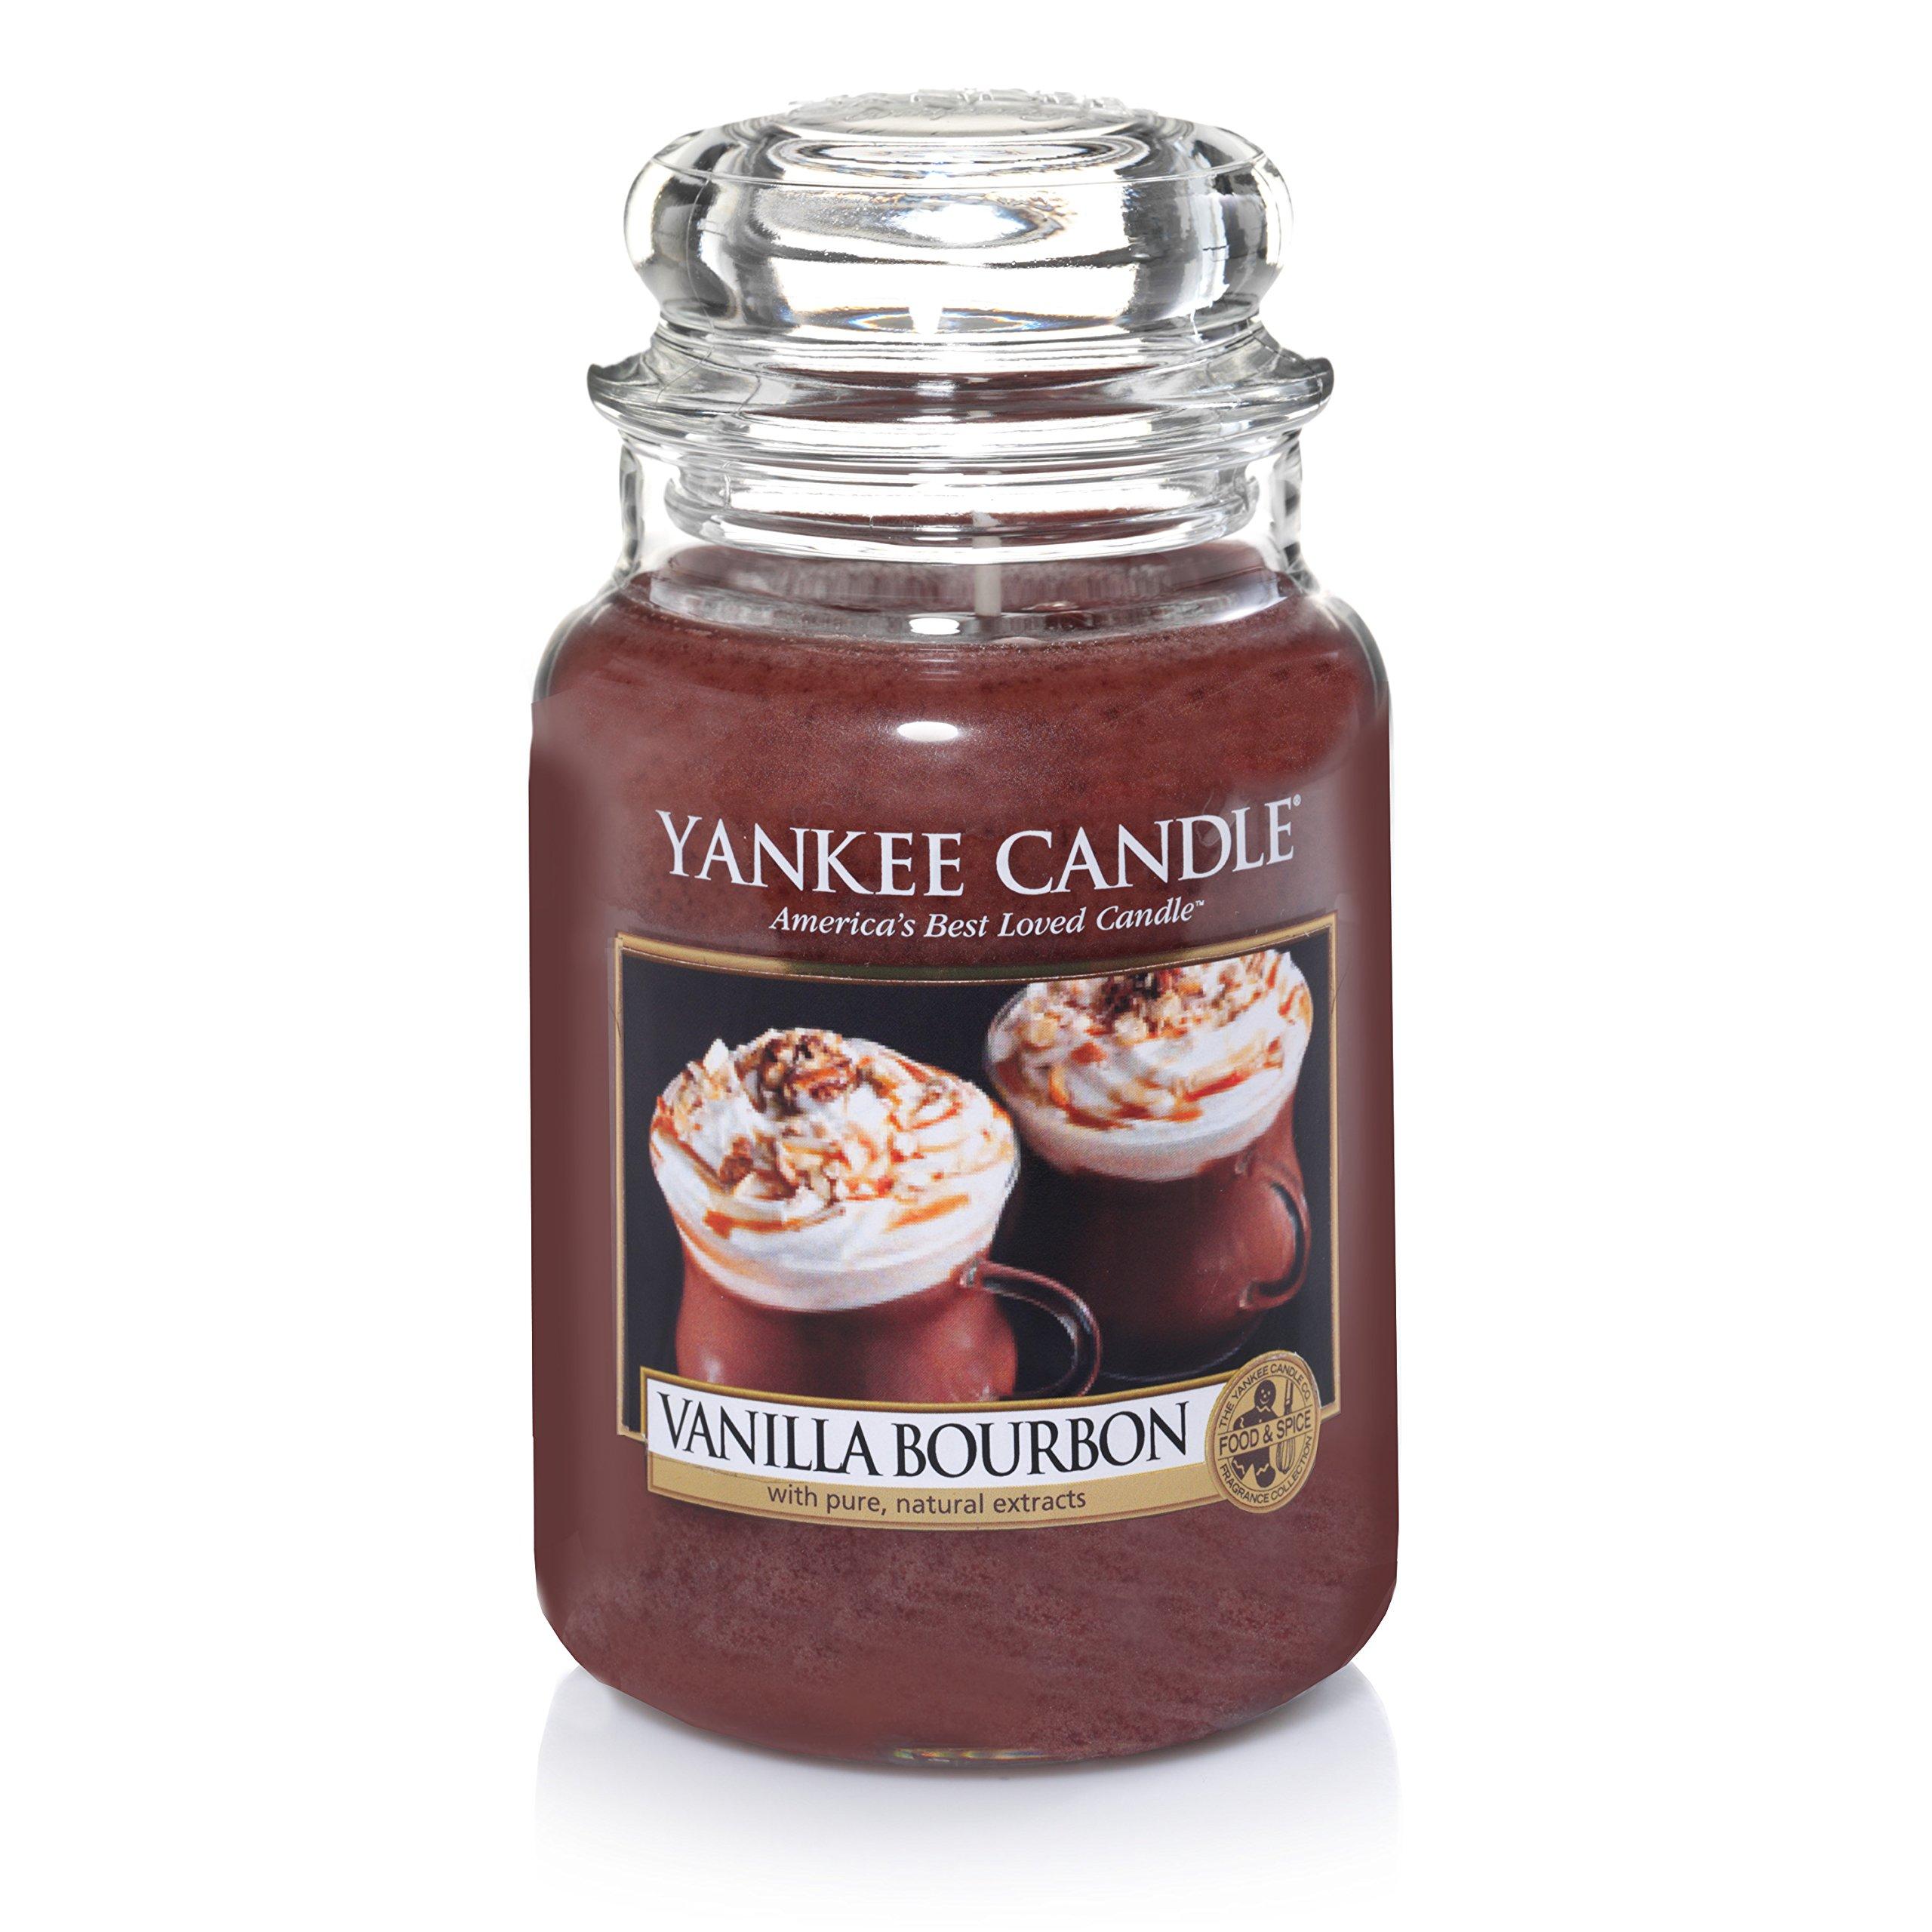 Yankee Candle Large Jar Candle, Vanilla Bourbon